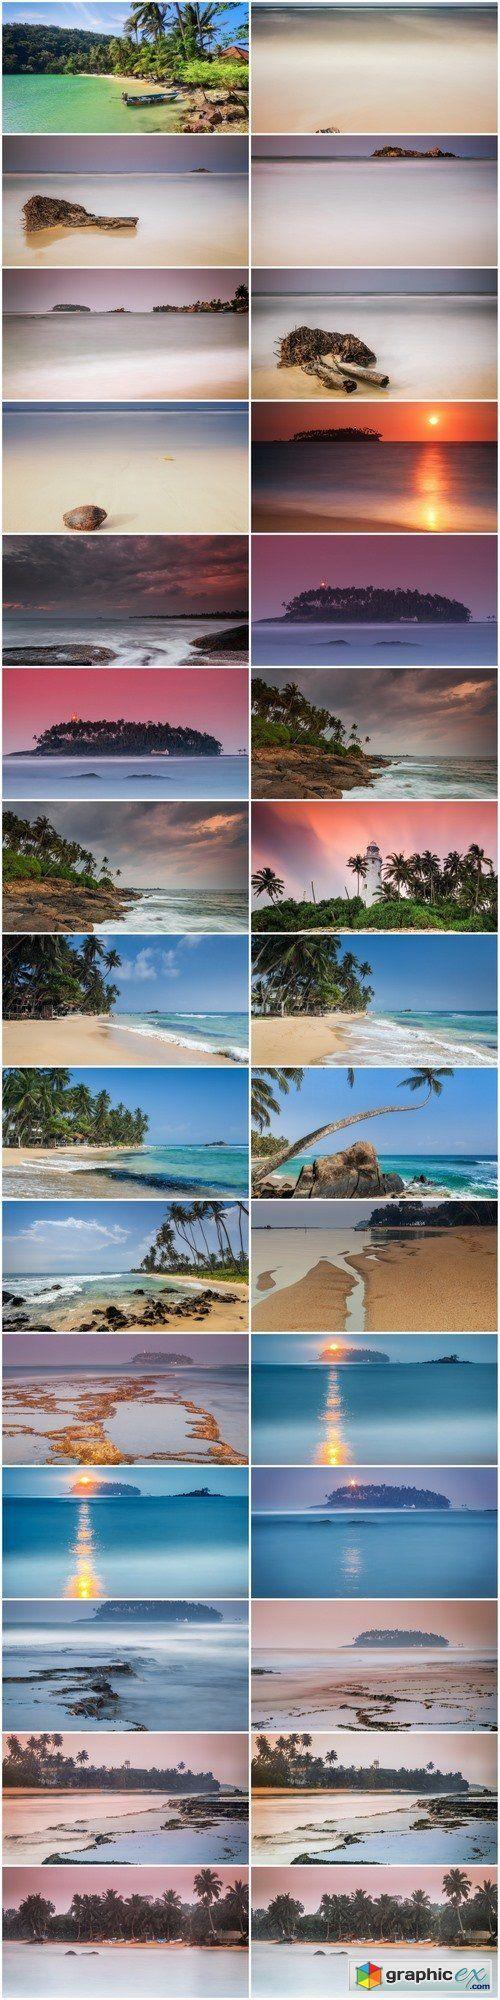 Sri Lanka. Beruwela. Beach Moragalla  stock images